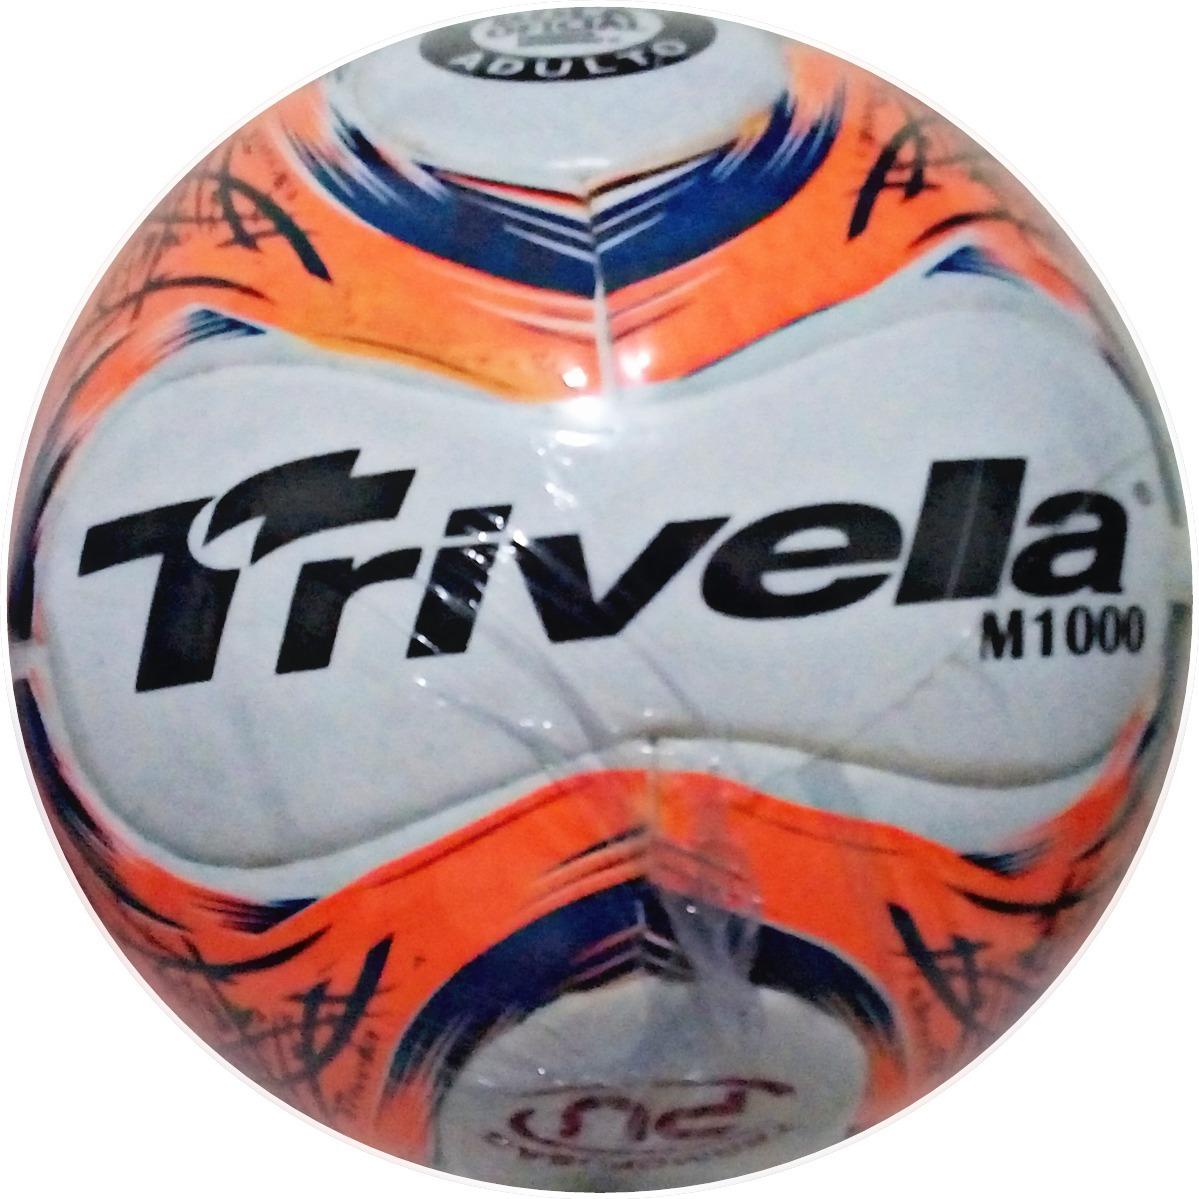 4321daf758643 Bola Futsal Futebol Trivella Original Promoção - Brasil Gold - R  60 ...